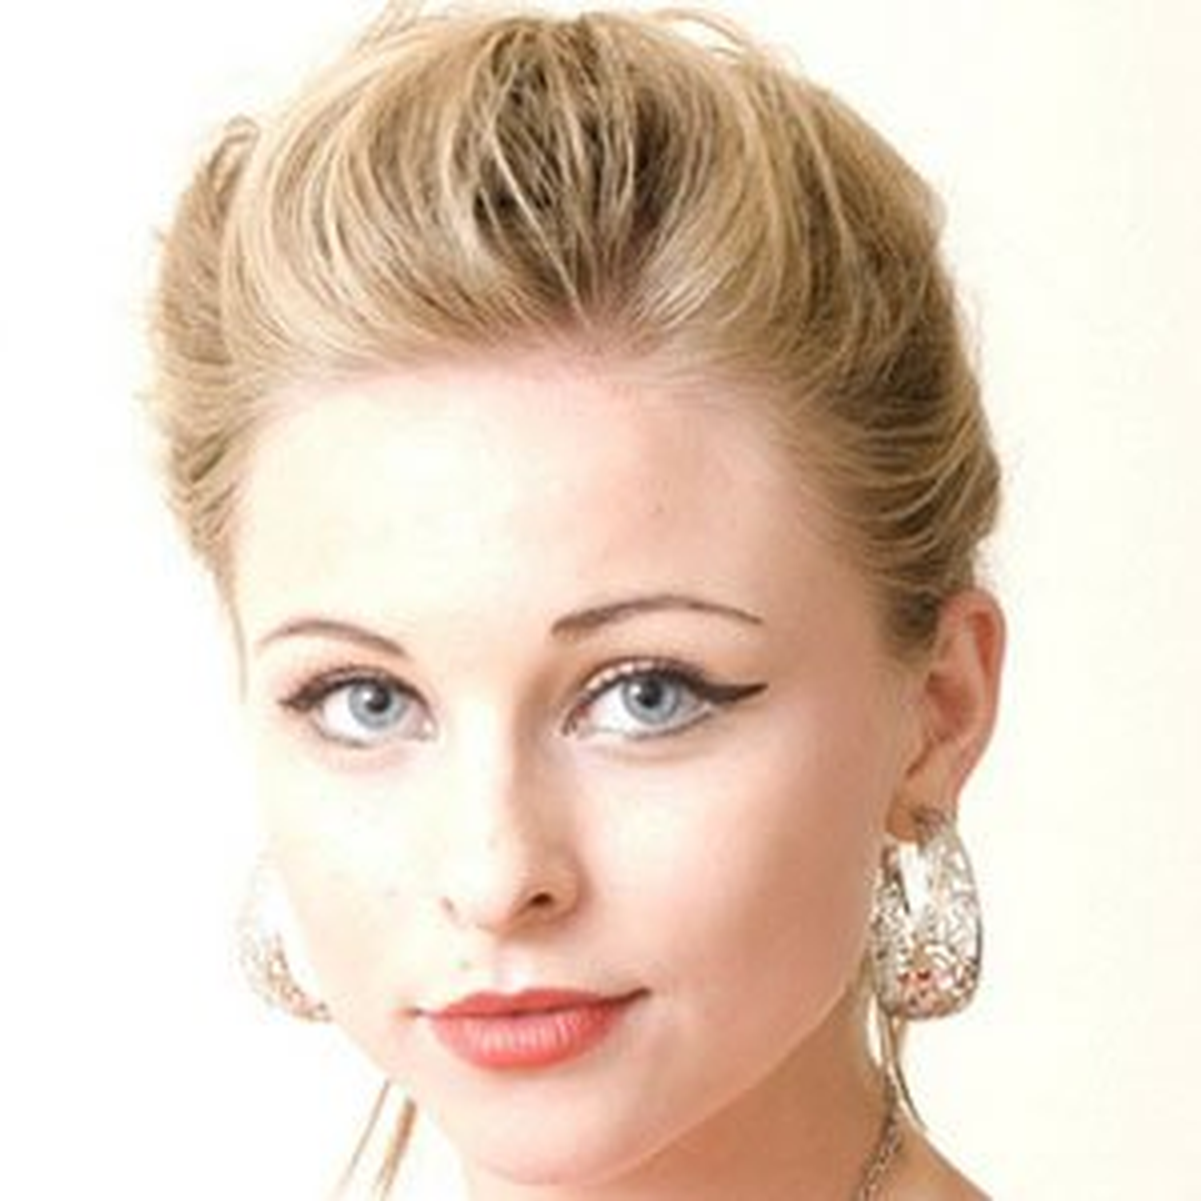 Shelby Wulfert wiki, Shelby Wulfert bio, Shelby Wulfert news